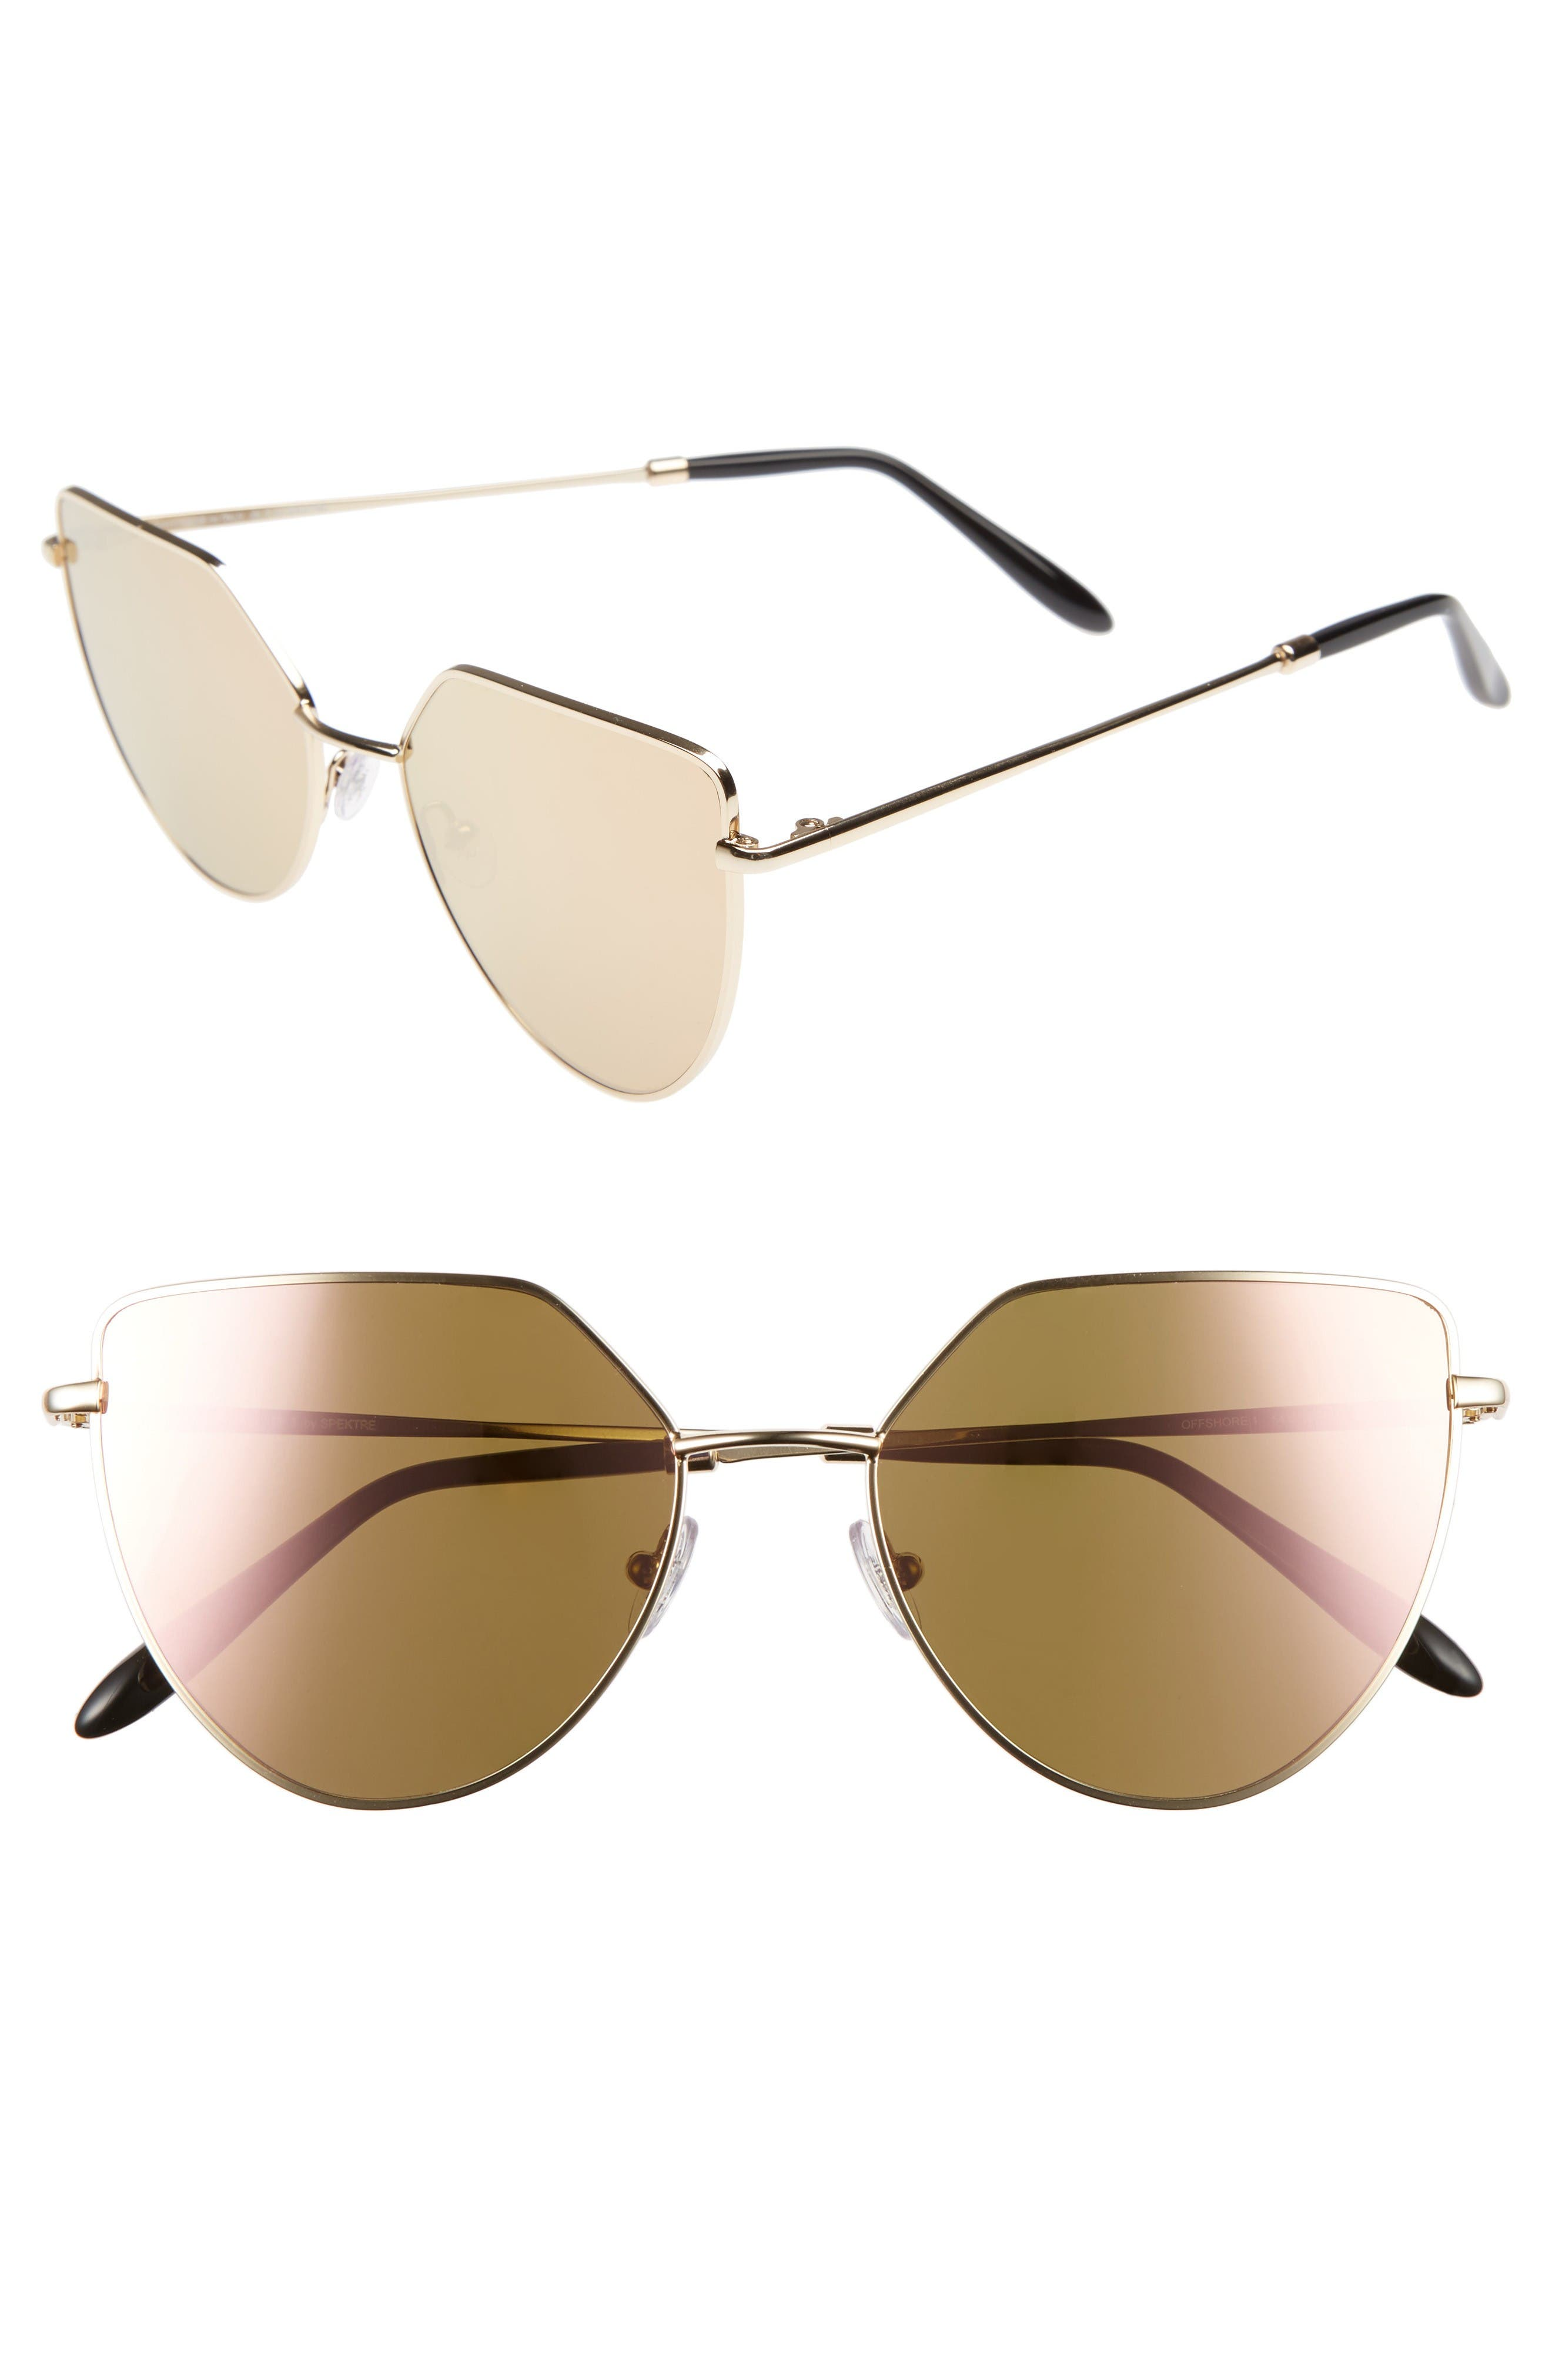 Alternate Image 1 Selected - Spektre Off Shore 1 54mm Retro Sunglasses